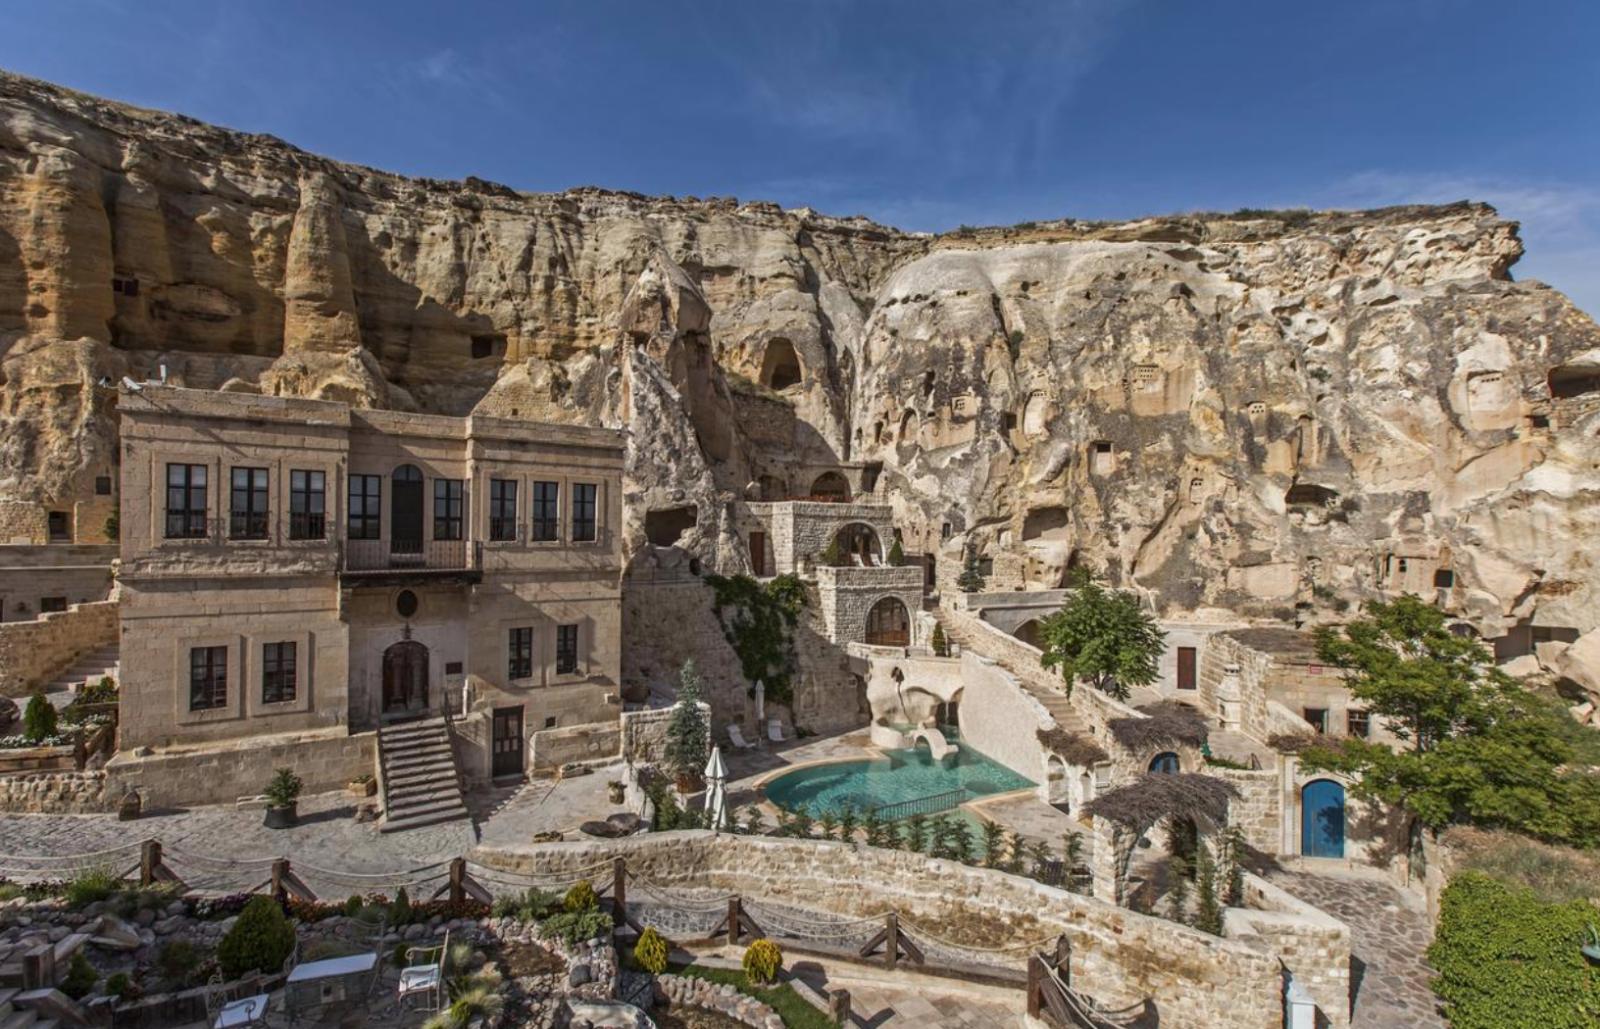 Yunak Evleri Cappadocia, booking.com